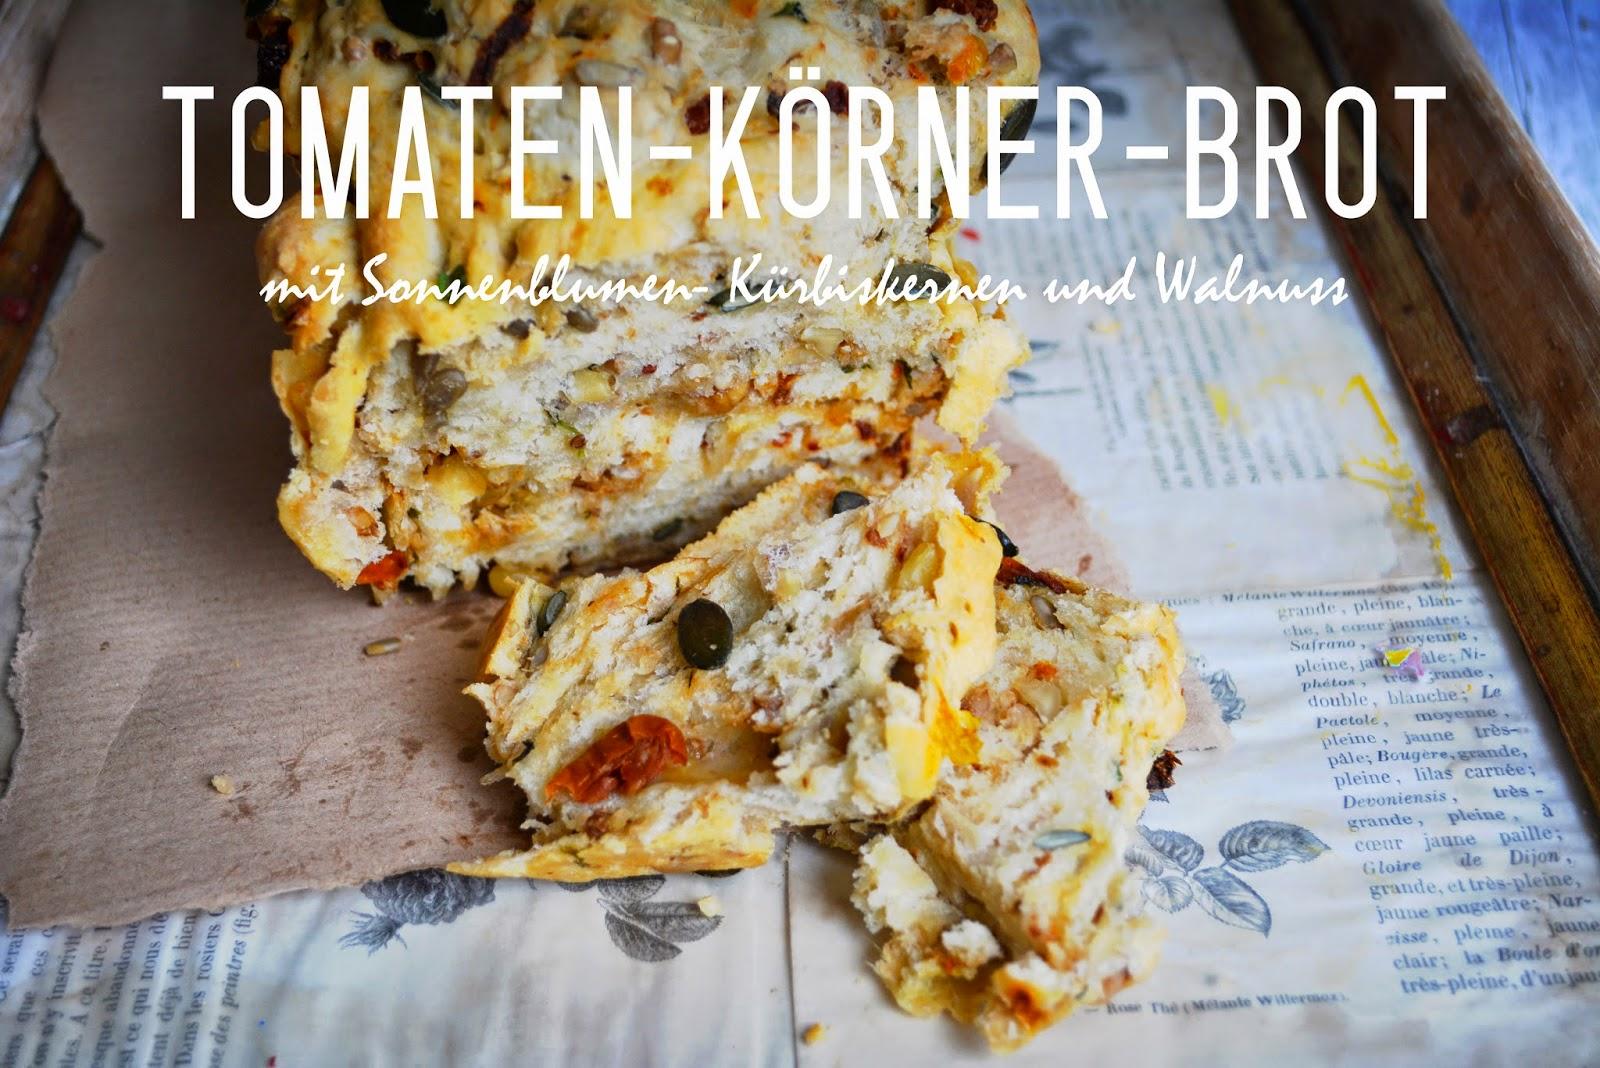 http://pia-malagala.blogspot.de/2015/01/tomaten-korner-brot.html